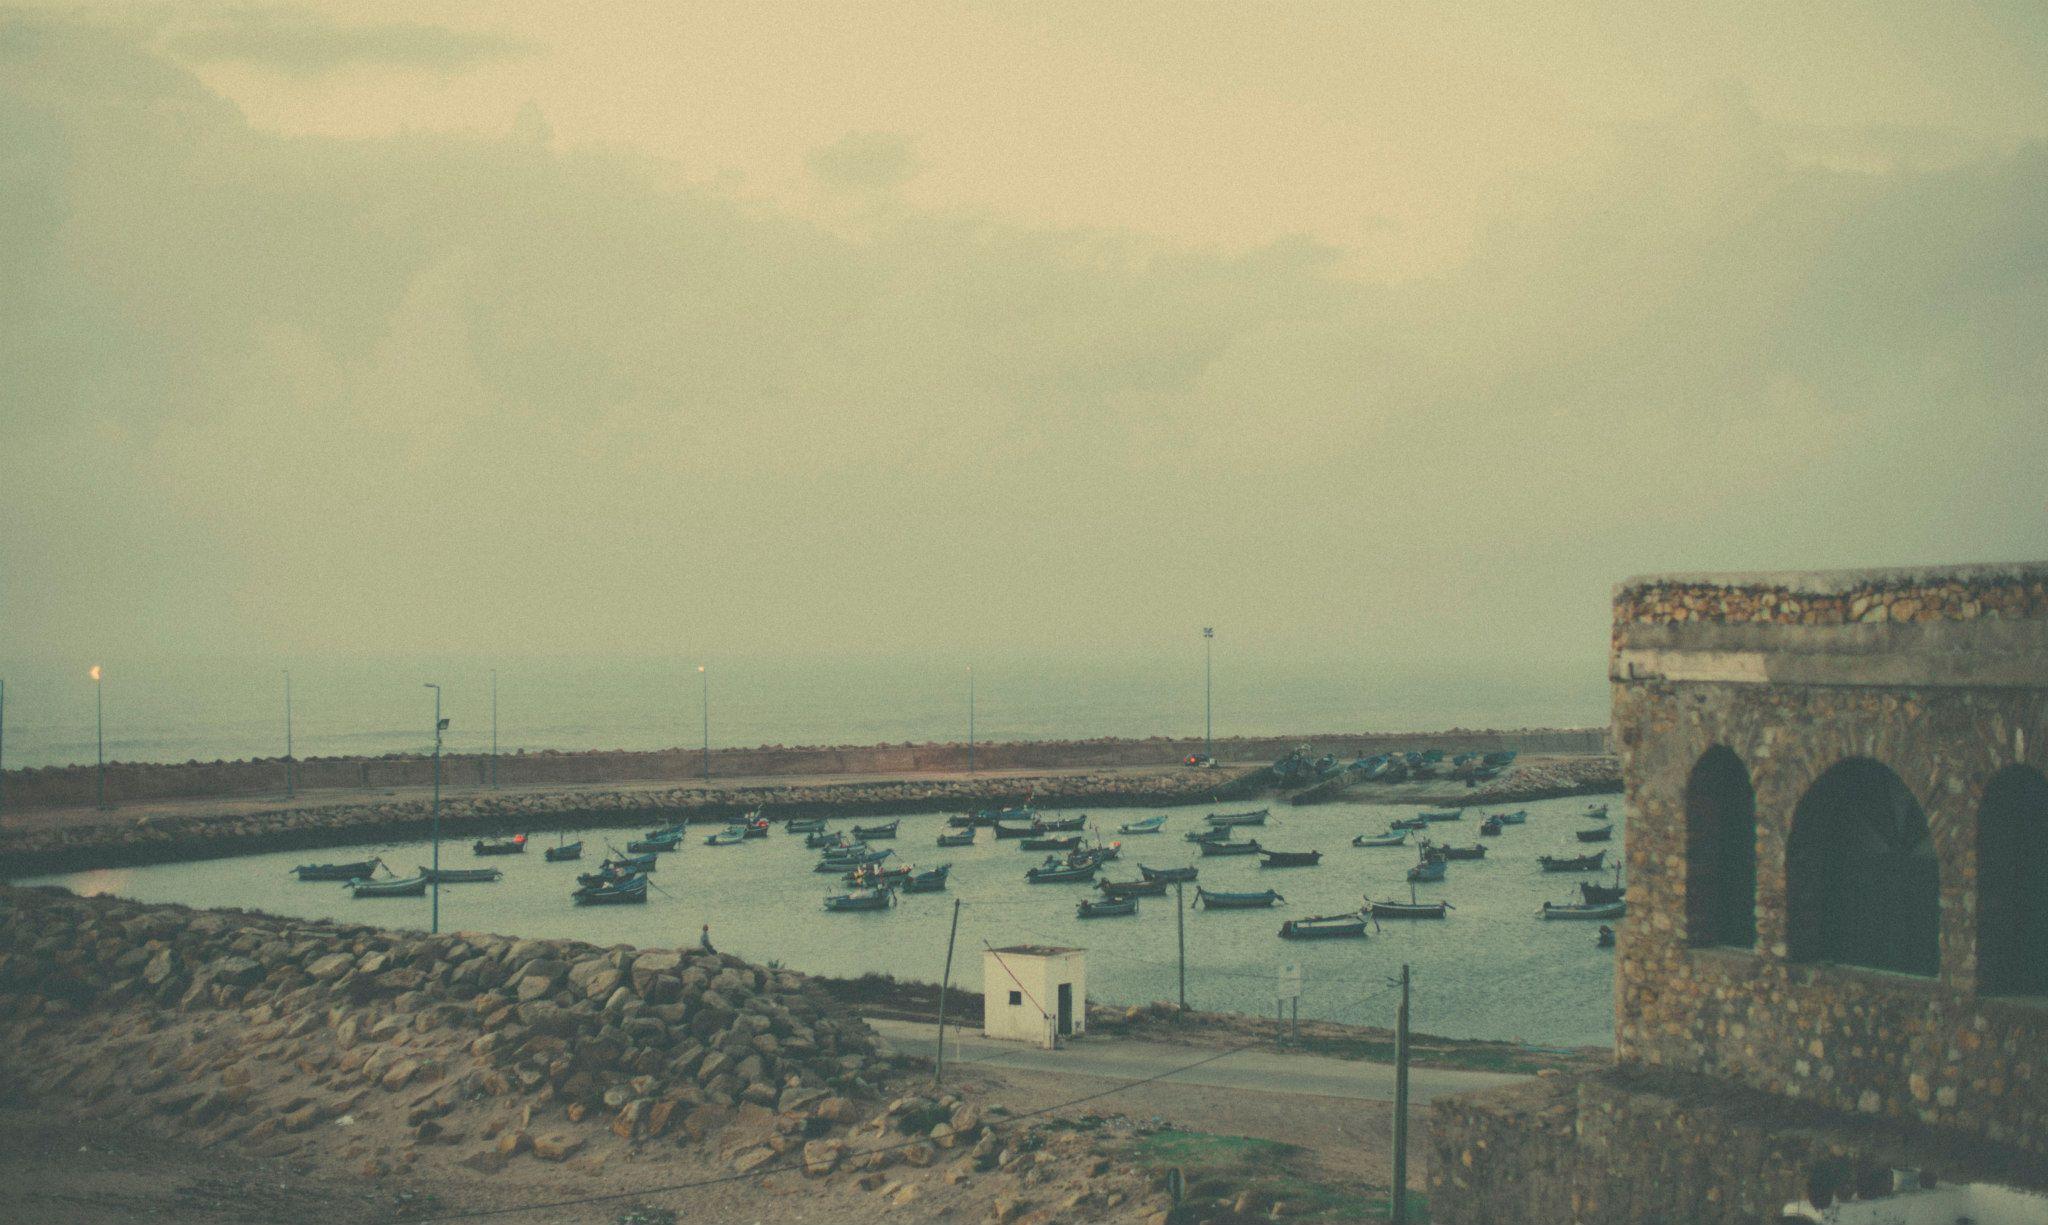 ph: Mariana Rubio Pittaluga |Camera:Pentax k1000 | 50mm | ASA 400 | |Shutter: 1/60 |Aperture:f/2.0